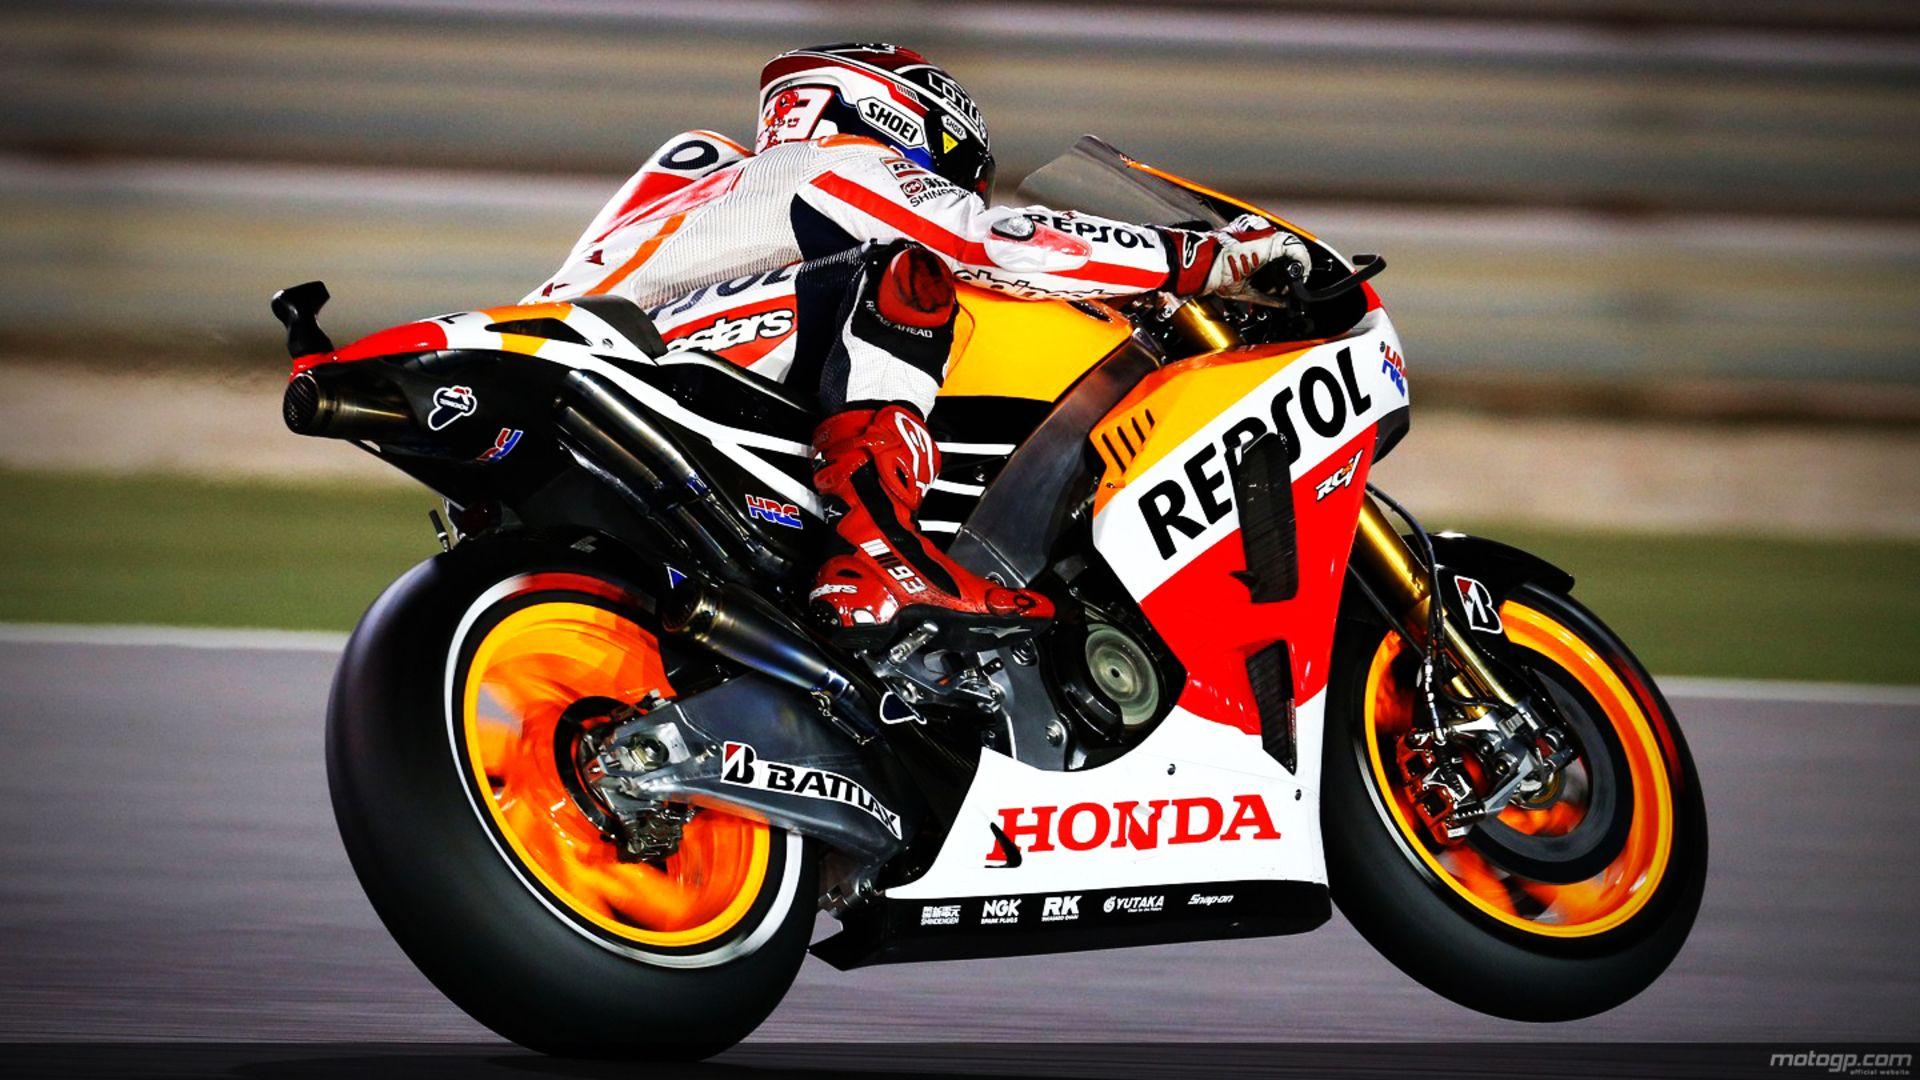 Sports-moto-gp-marc-marquez-2014-wallpaper.jpg (1920×1080)   MOTOS   Pinterest